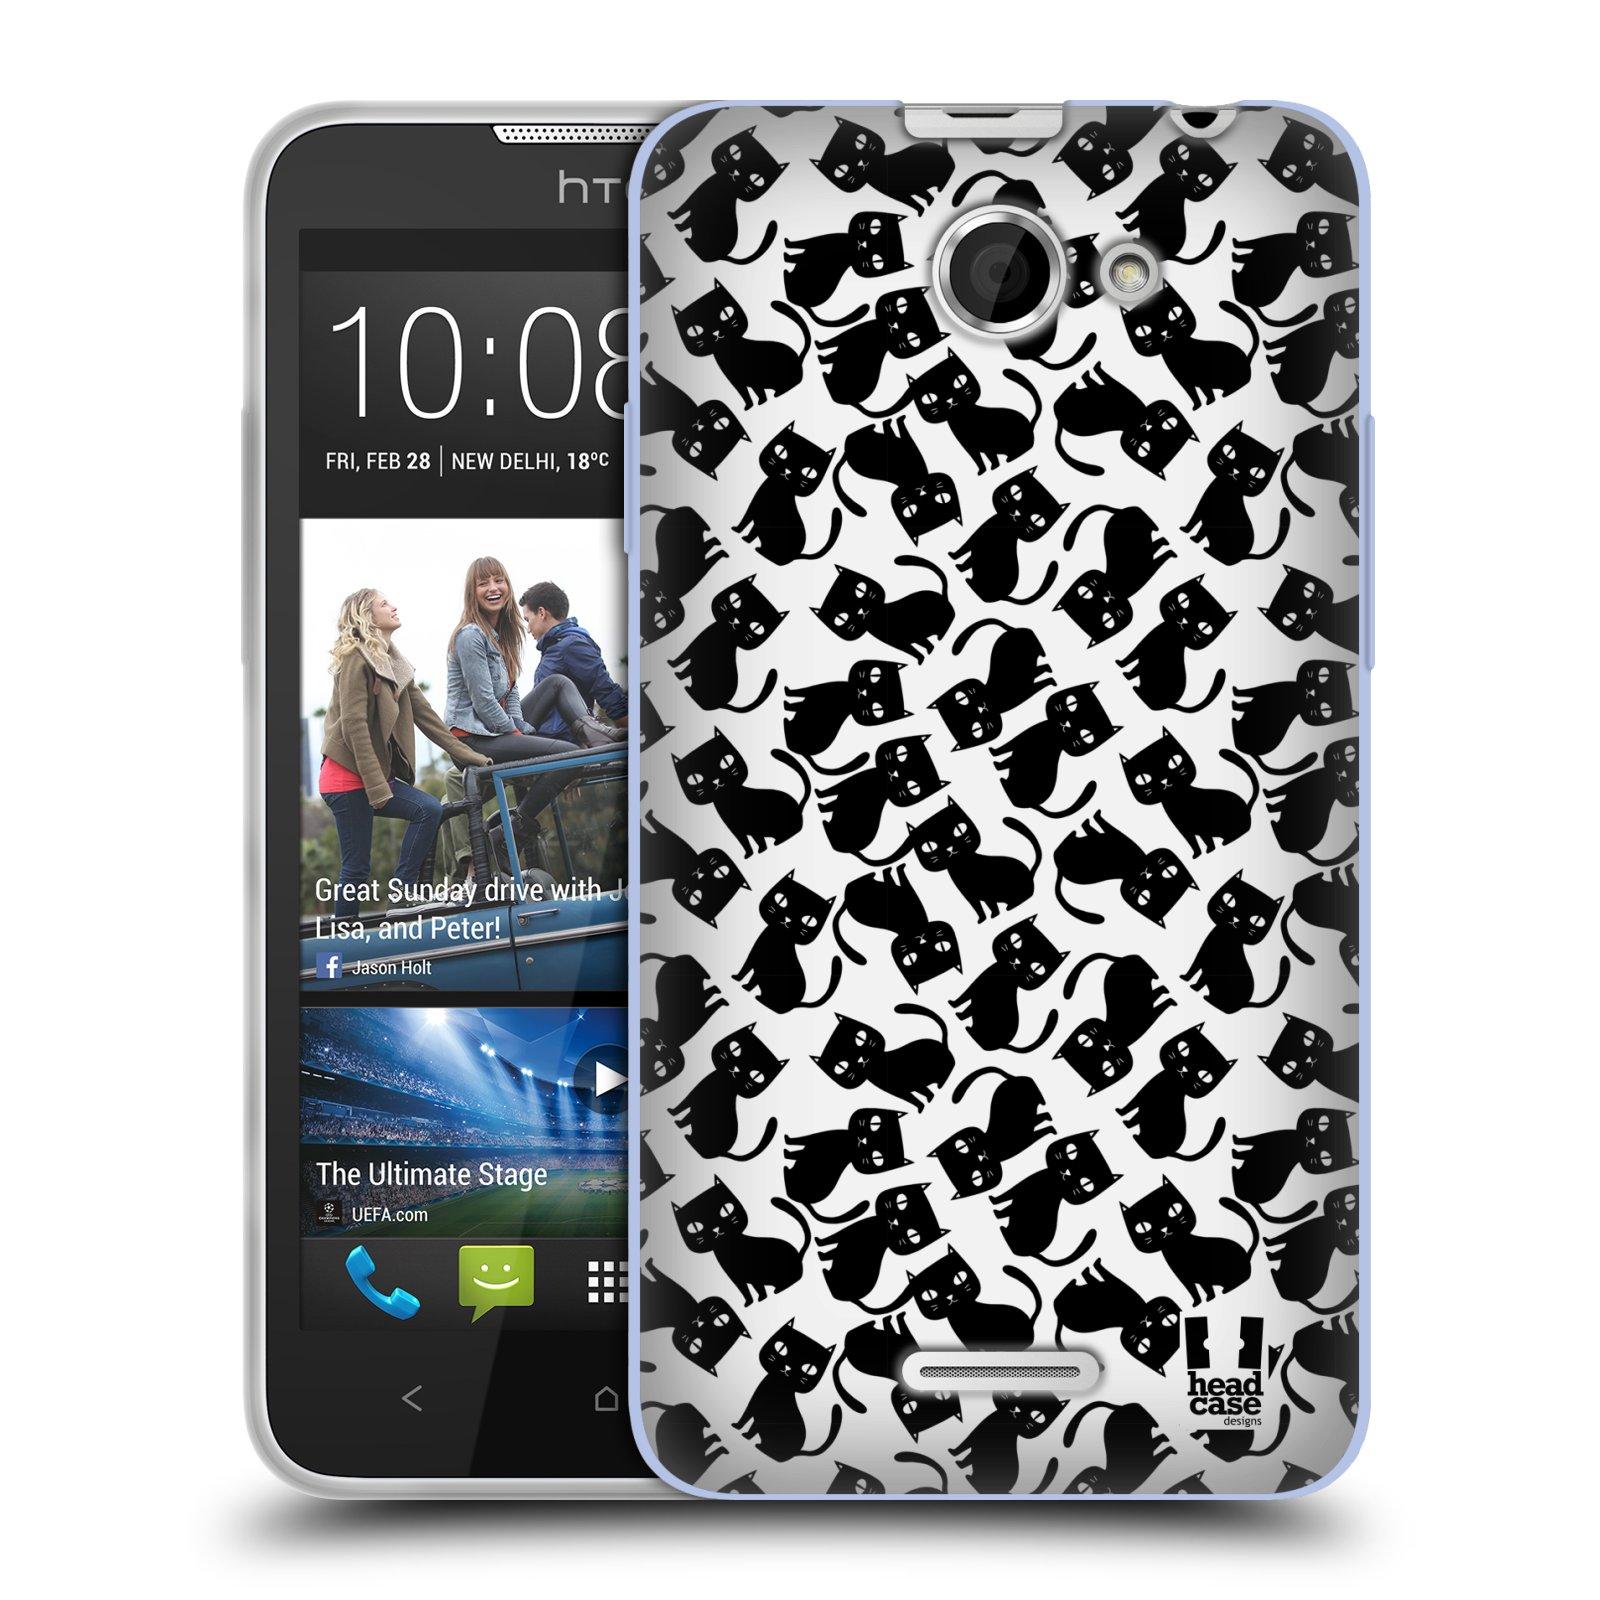 Silikonové pouzdro na mobil HTC Desire 516 HEAD CASE KOČKY Black Pattern (Silikonový kryt či obal na mobilní telefon HTC Desire 516 Dual SIM)